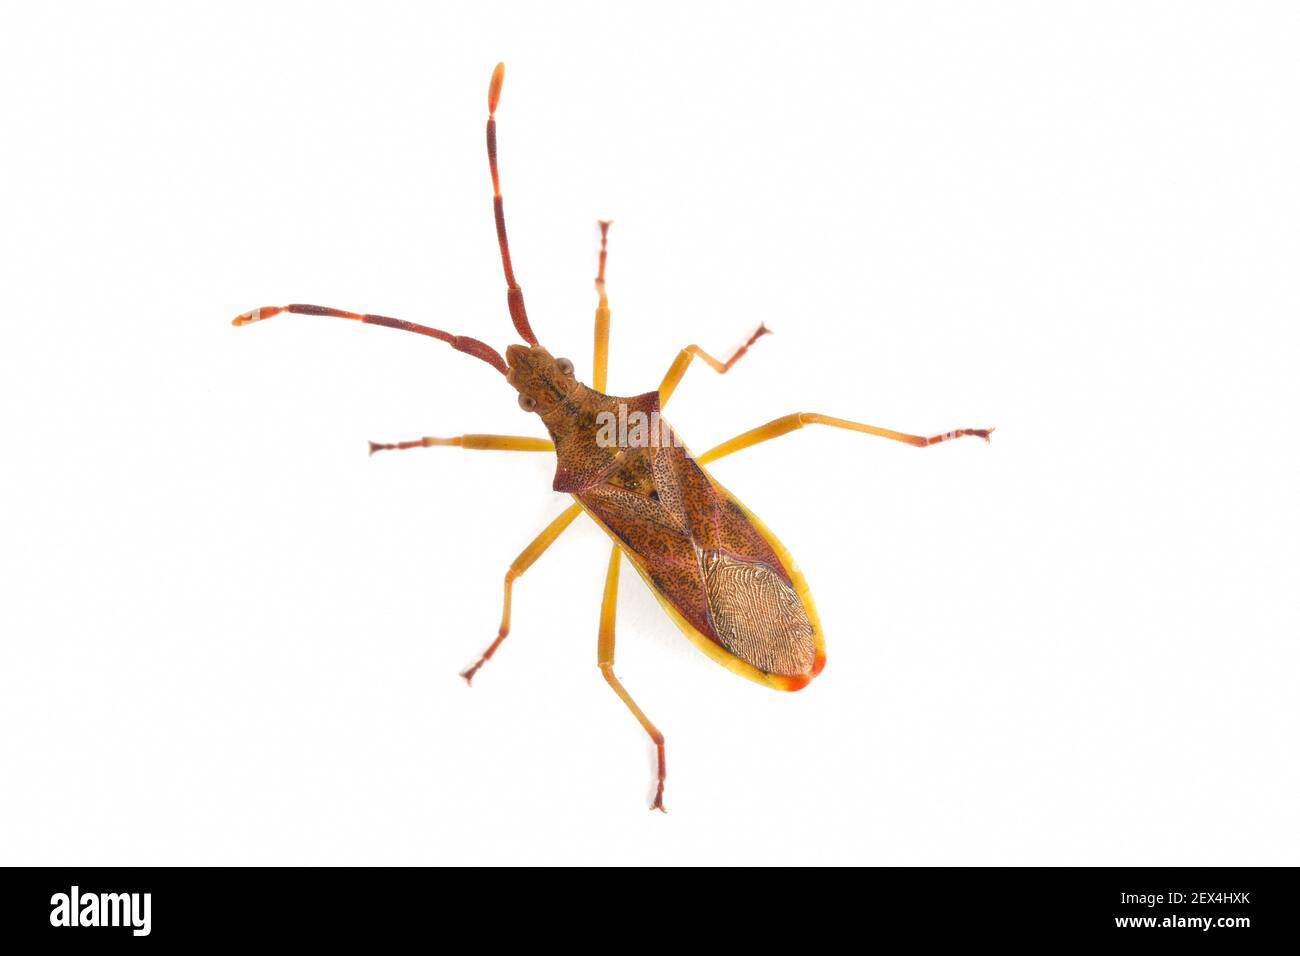 Juniper Bug (Gonocerus juniperi) sobre fondo blanco, Vaucluse, Provenza, Francia Foto de stock